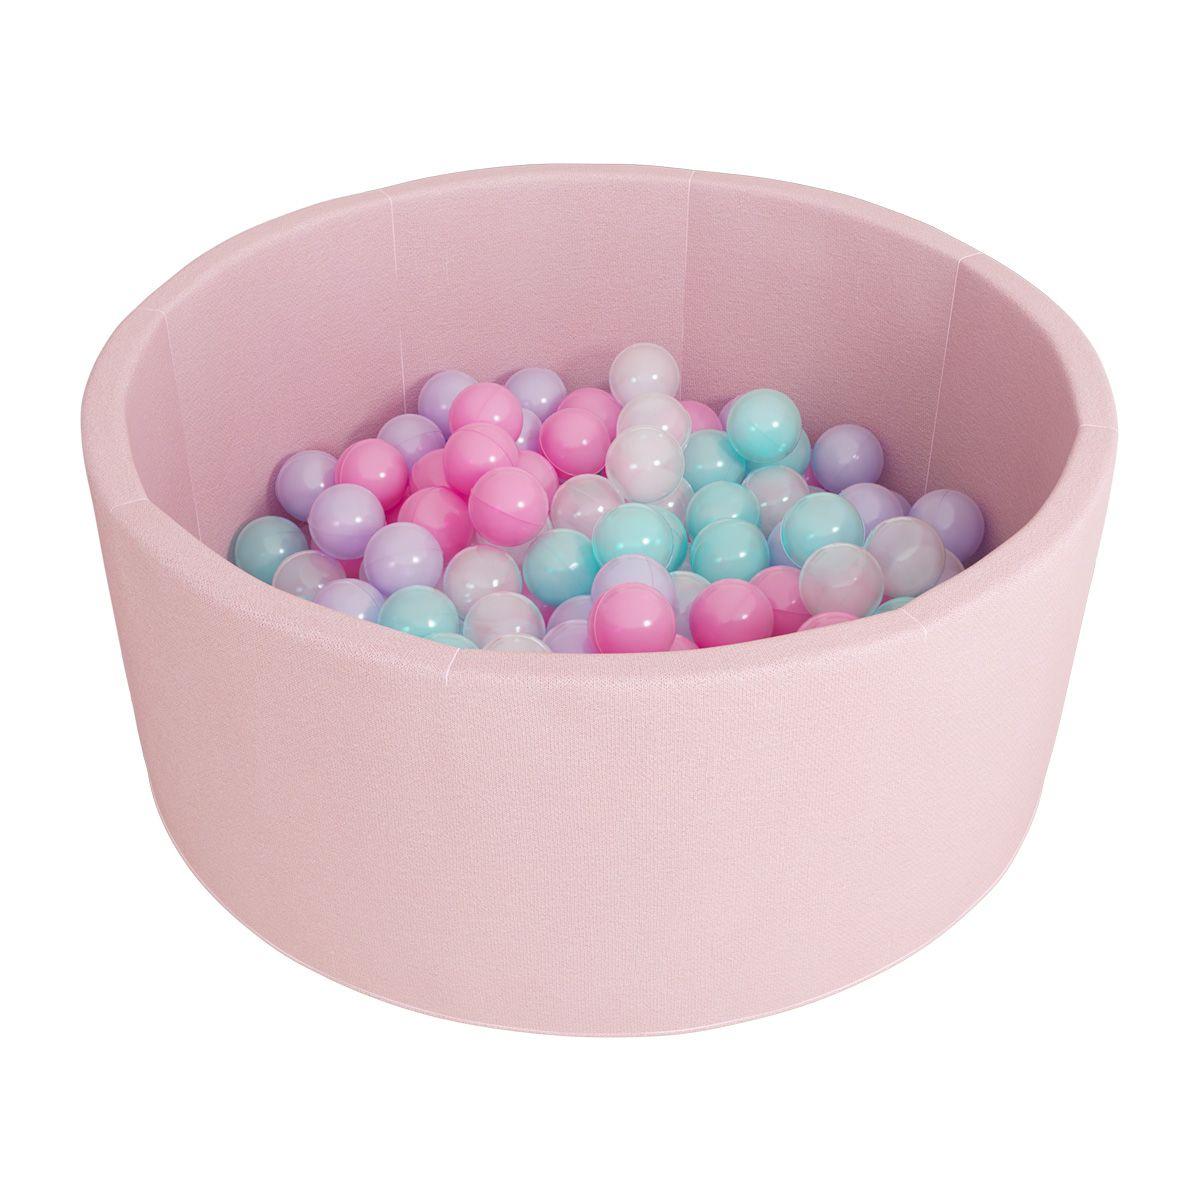 "Romana / Dry pool ""Airpool"", pink"